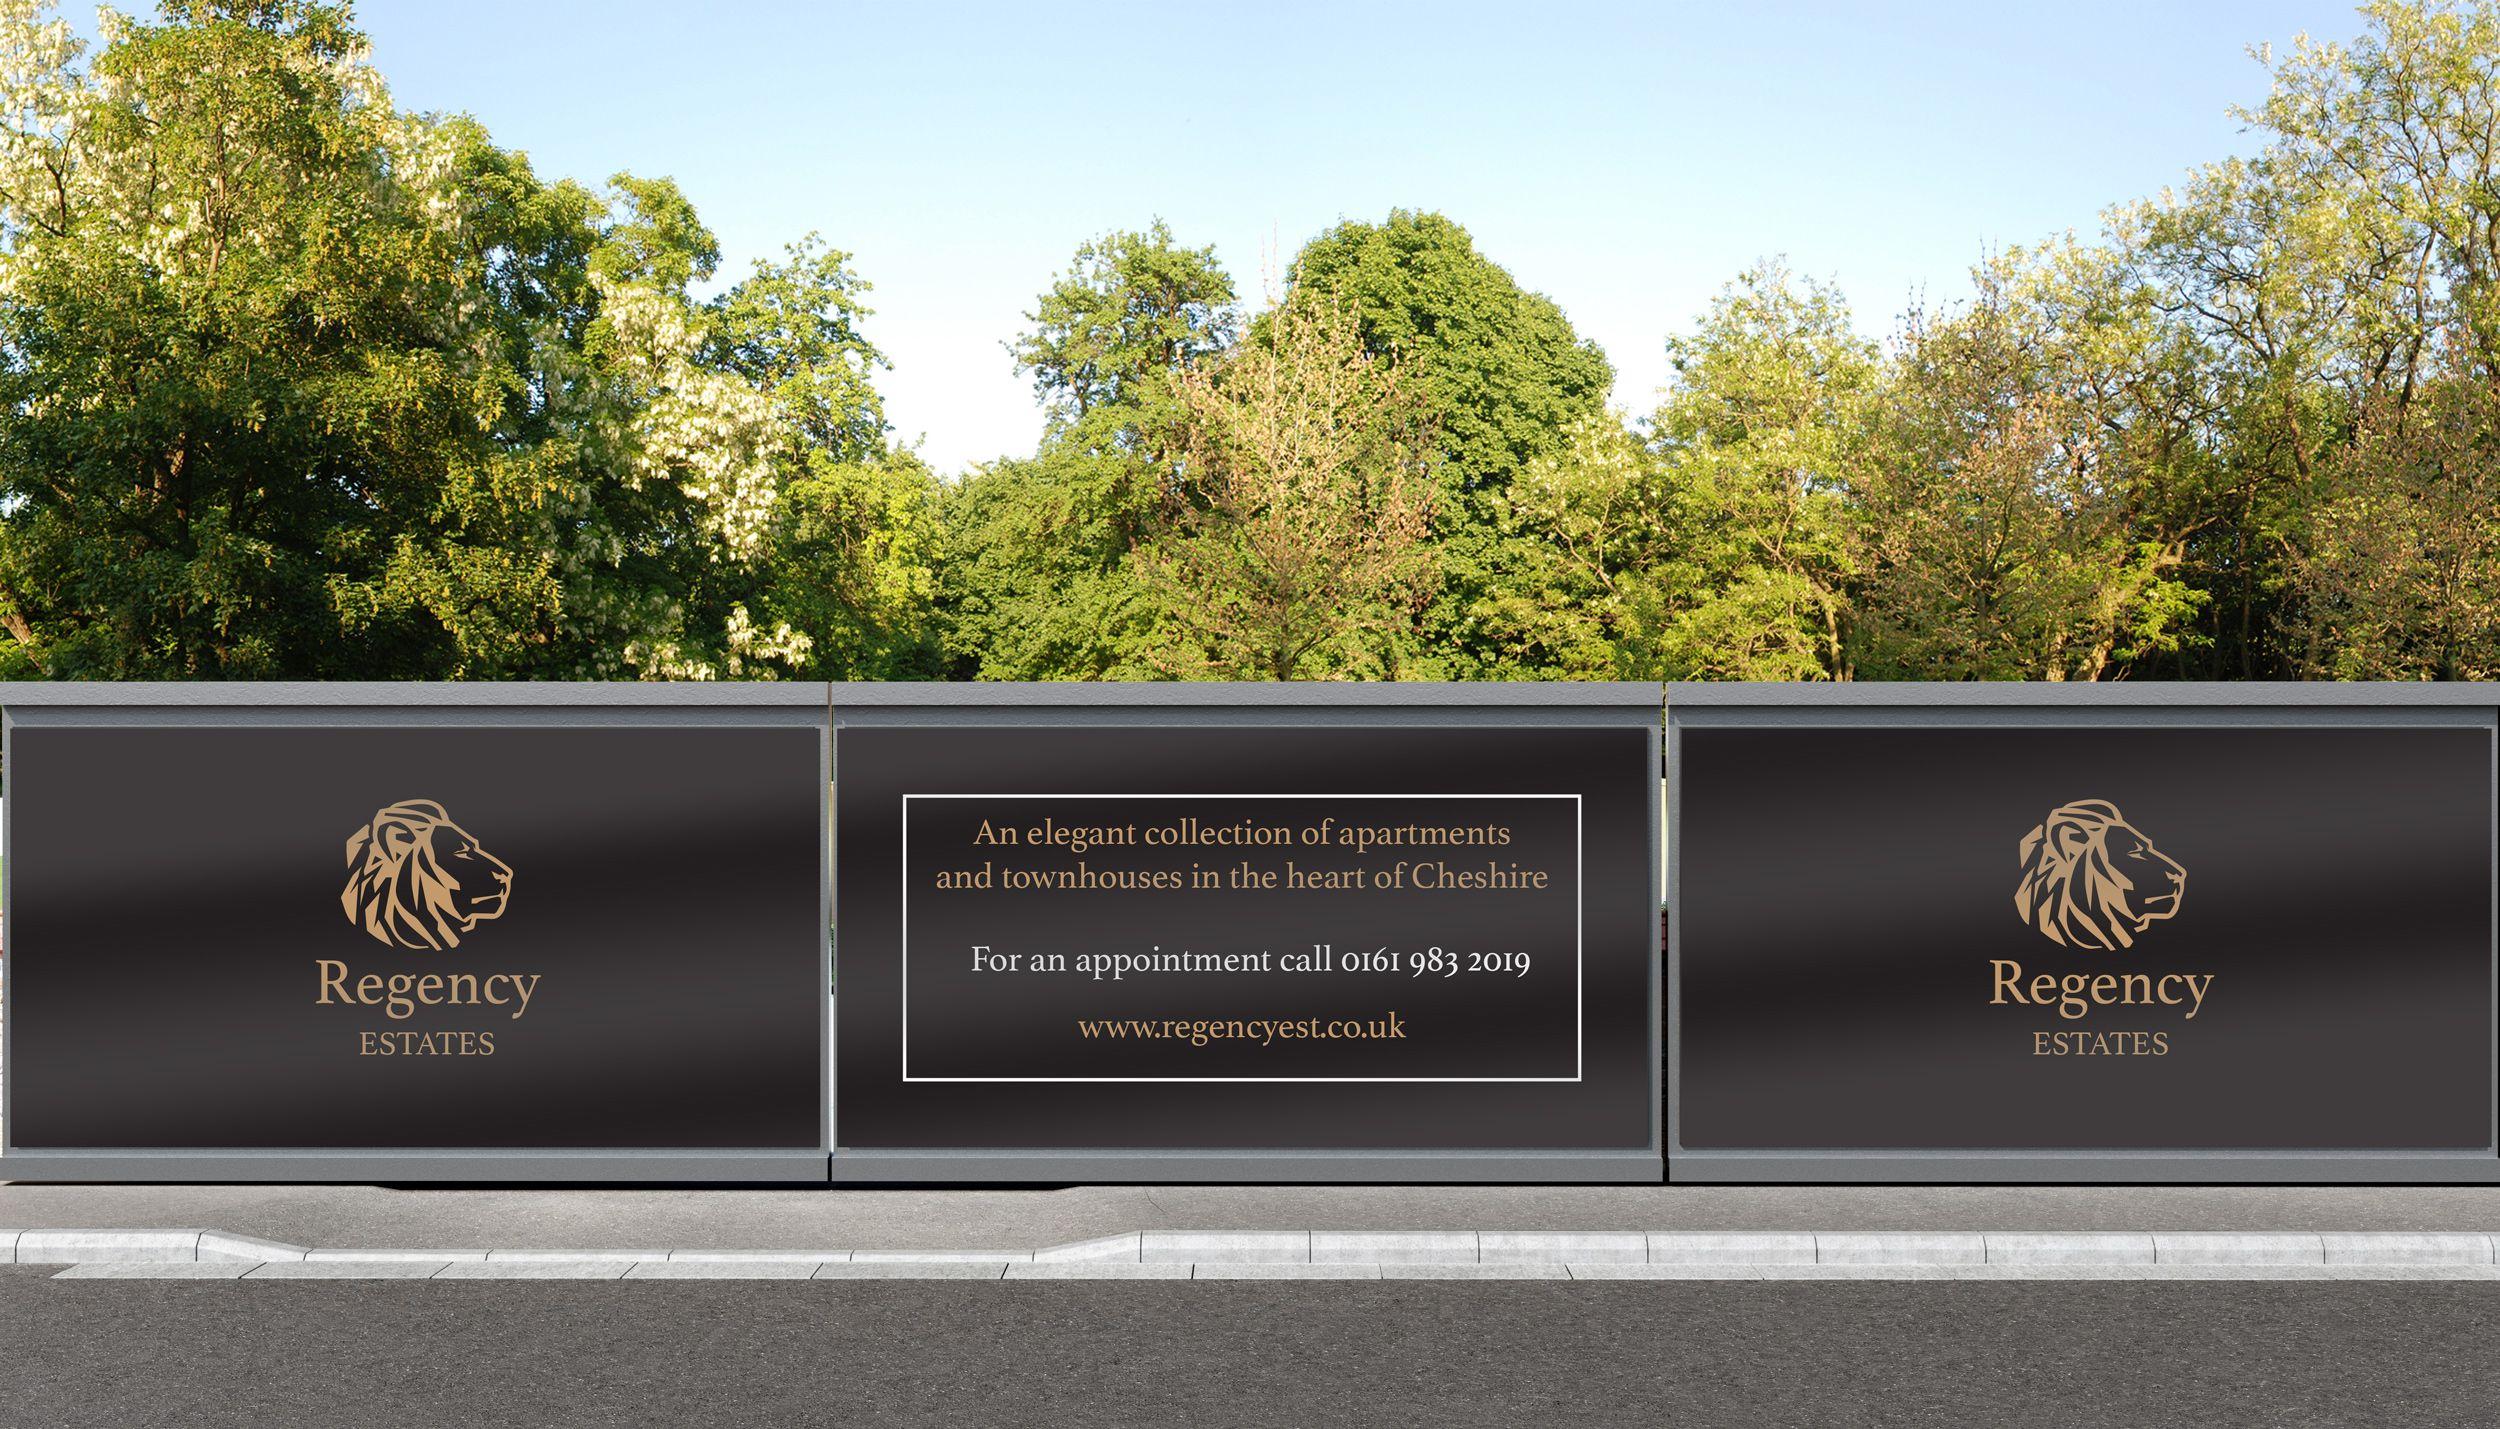 property marketing hoarding site signage manchester